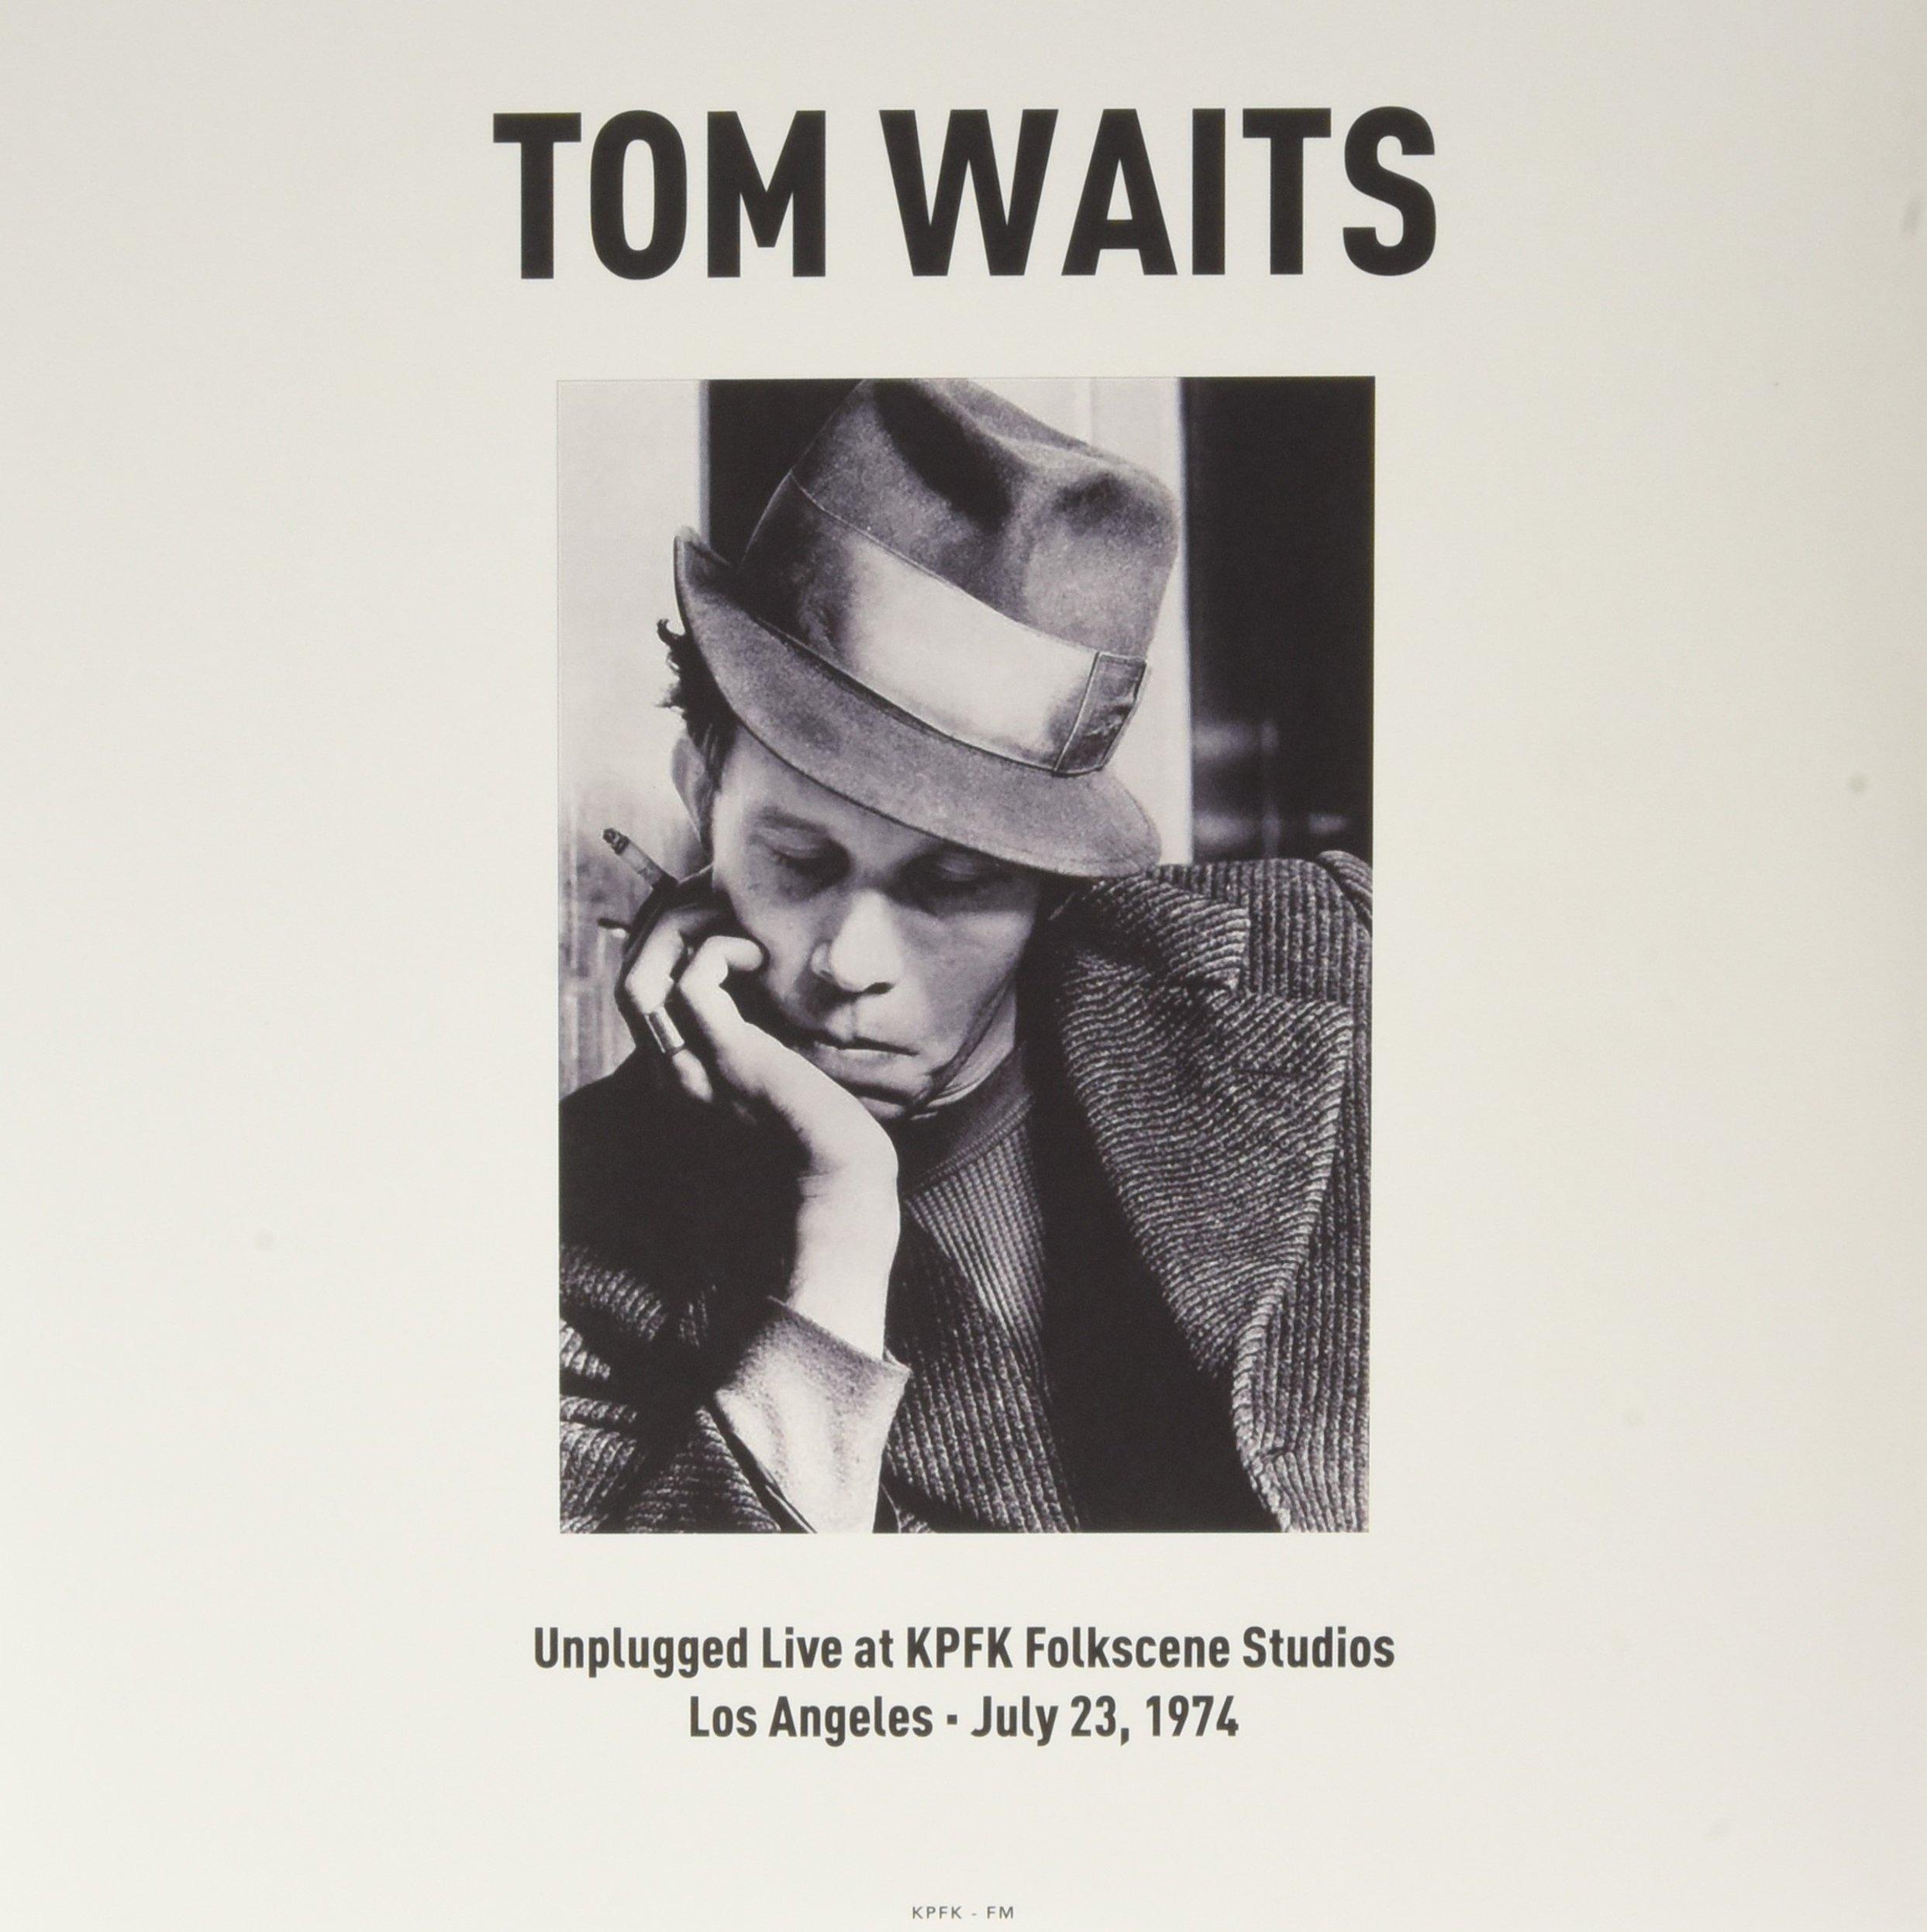 Tom Waits - Unplugged Live at Kpfk Folkscene Studios in Los An